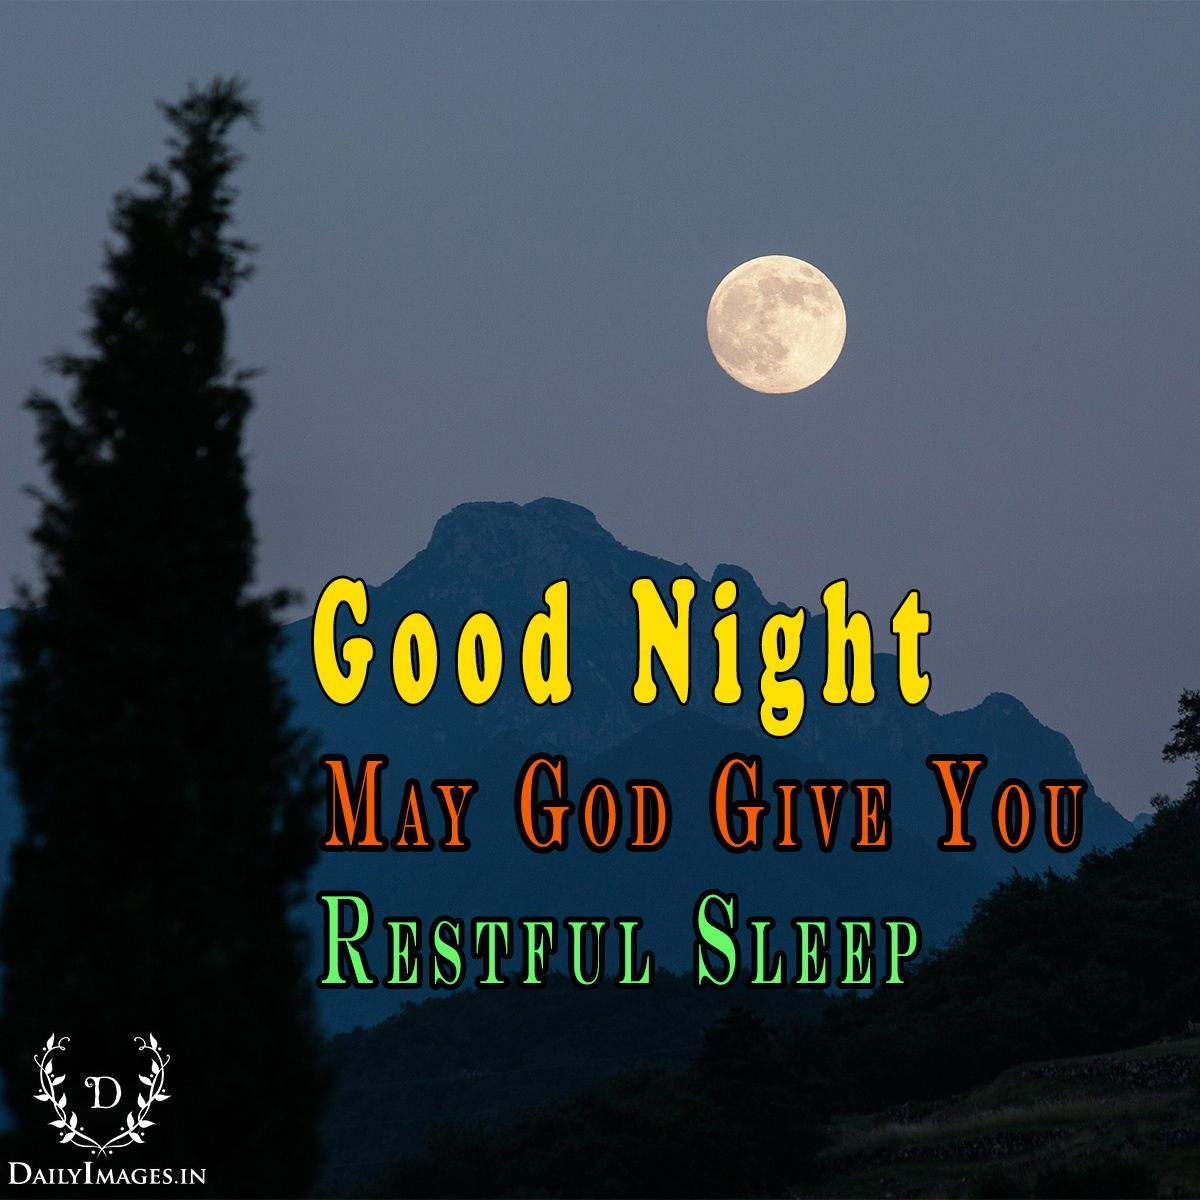 Good Night May God Give You Restful Sleep Goodnight Gn Quotes Good Night Quotes Good Night Image Good Night